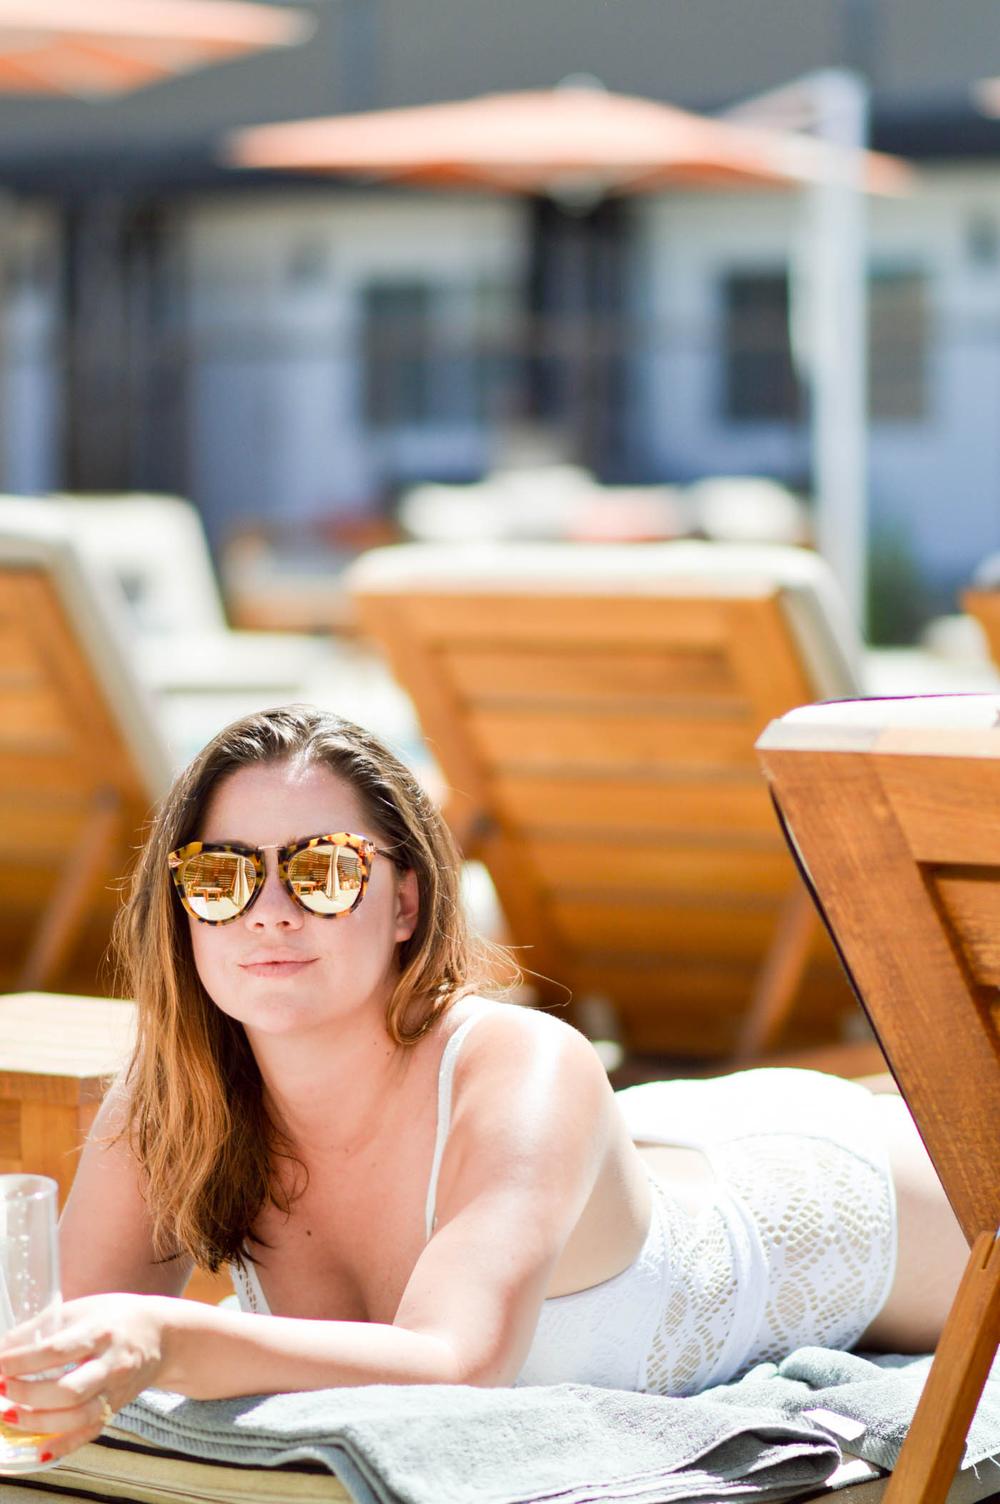 V Palm Springs Hotel, Via. www.birdieshoots.com